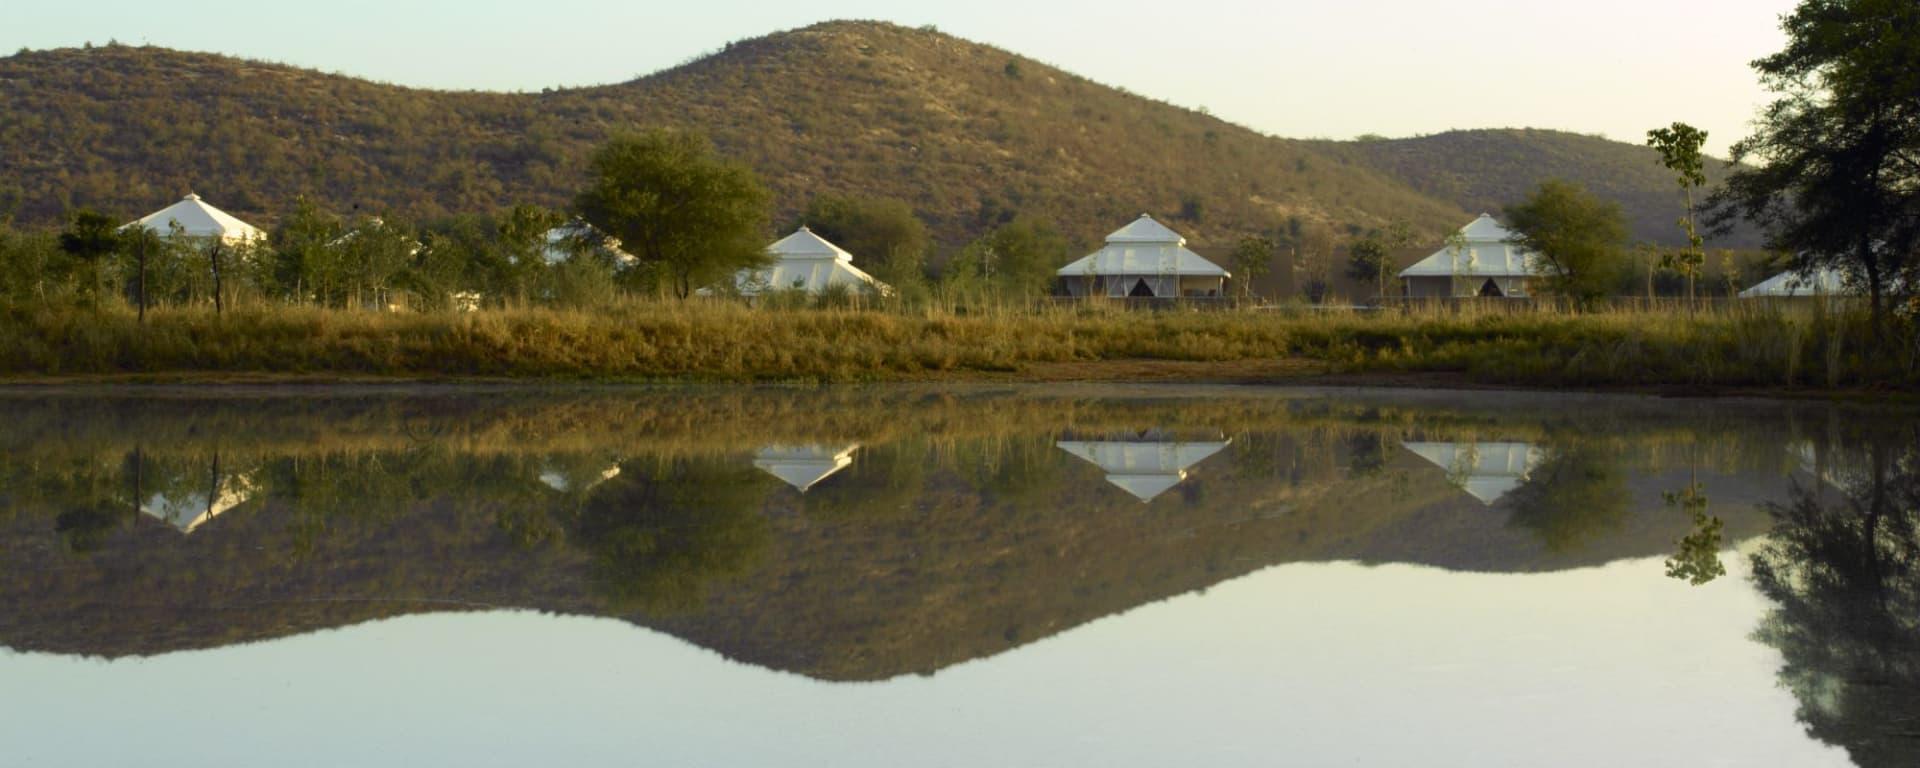 Aman-i-Khas à Ranthambore: Tents Exterior & Watering Hole